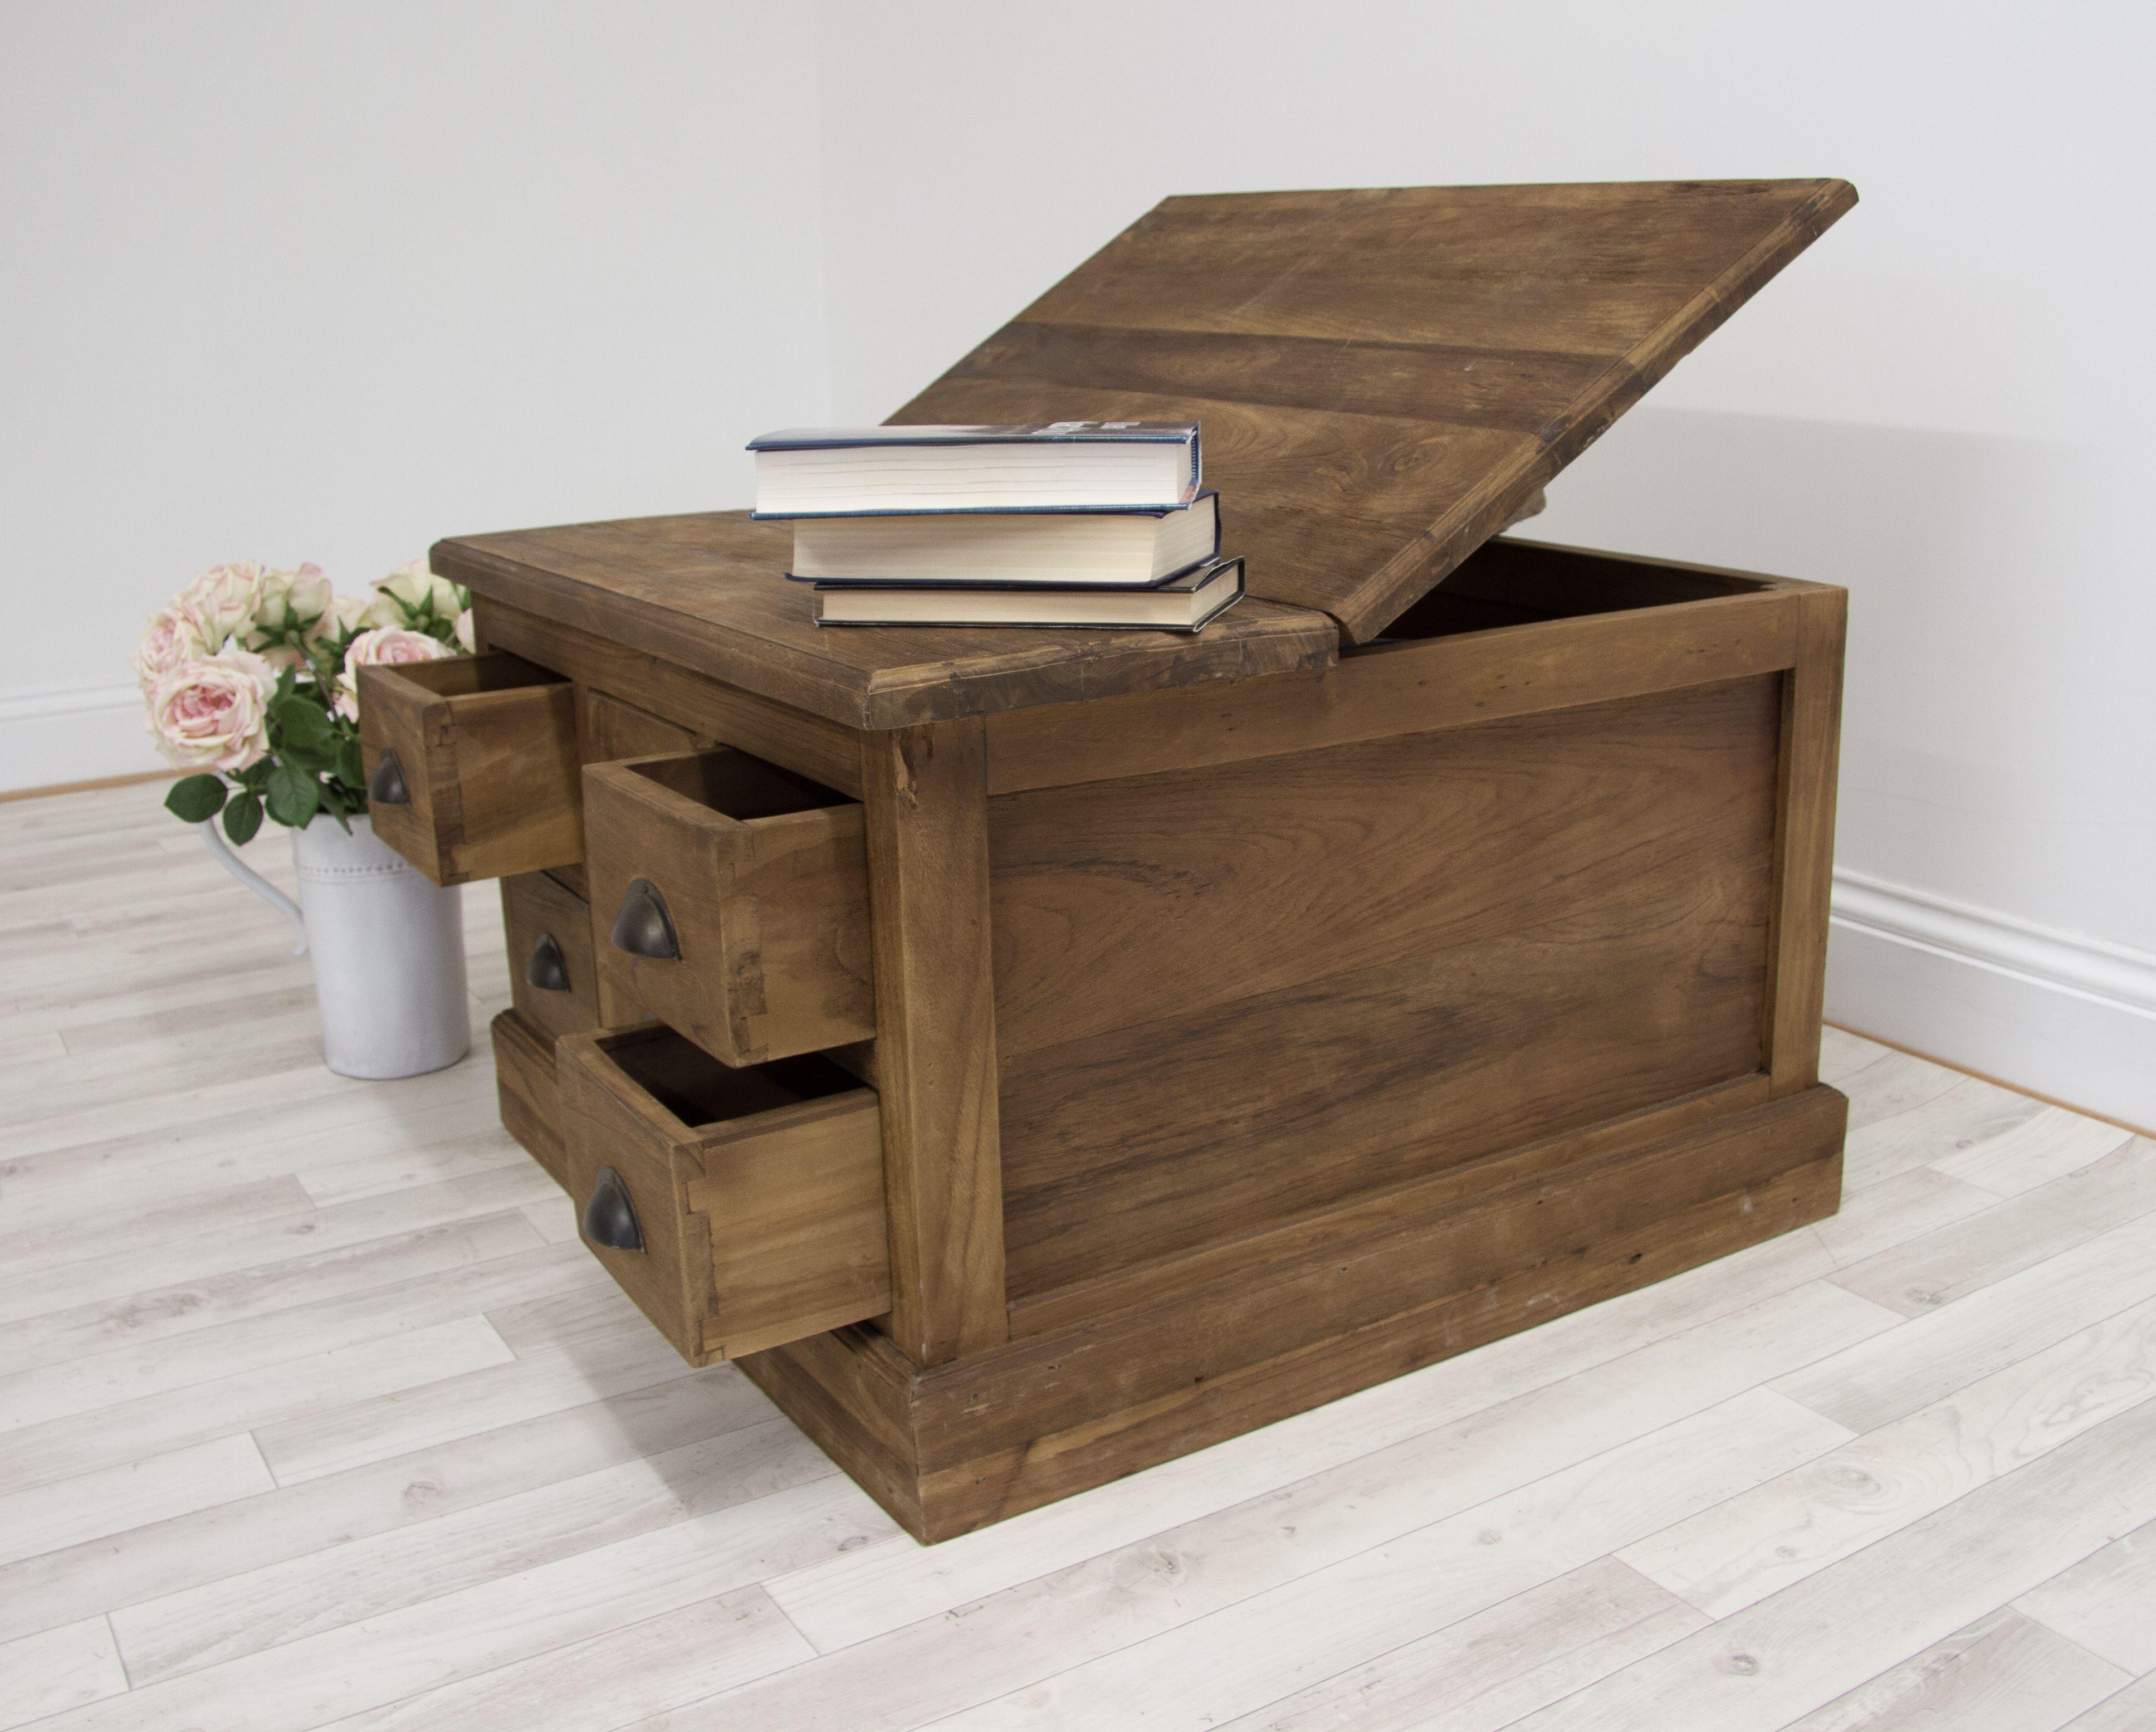 Teak Salon coffee table / storage unit